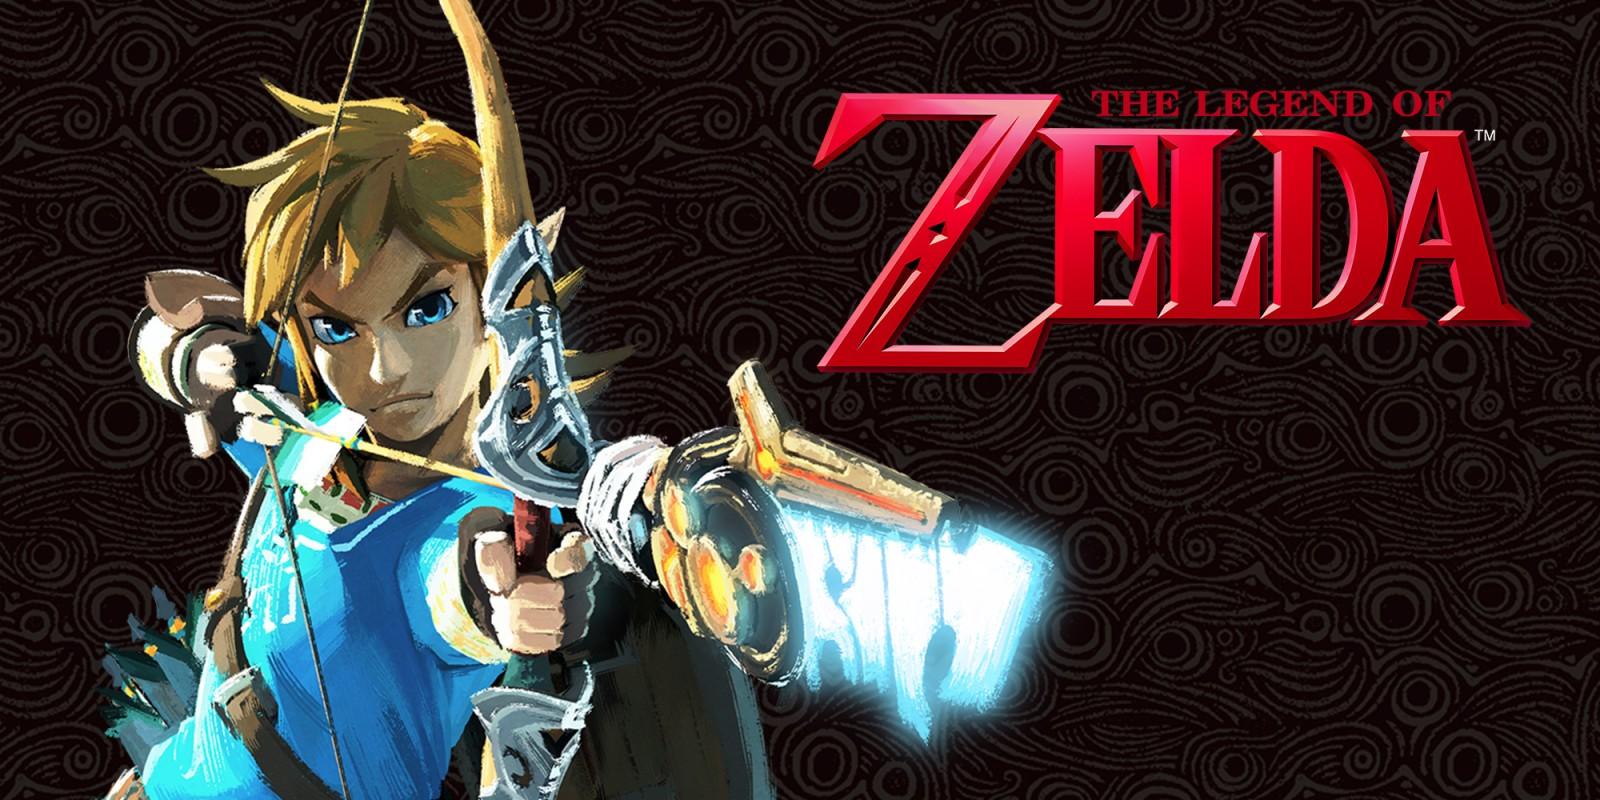 The Legend of Zelda: Breath of the Darkness, Gameplay Details Revealed